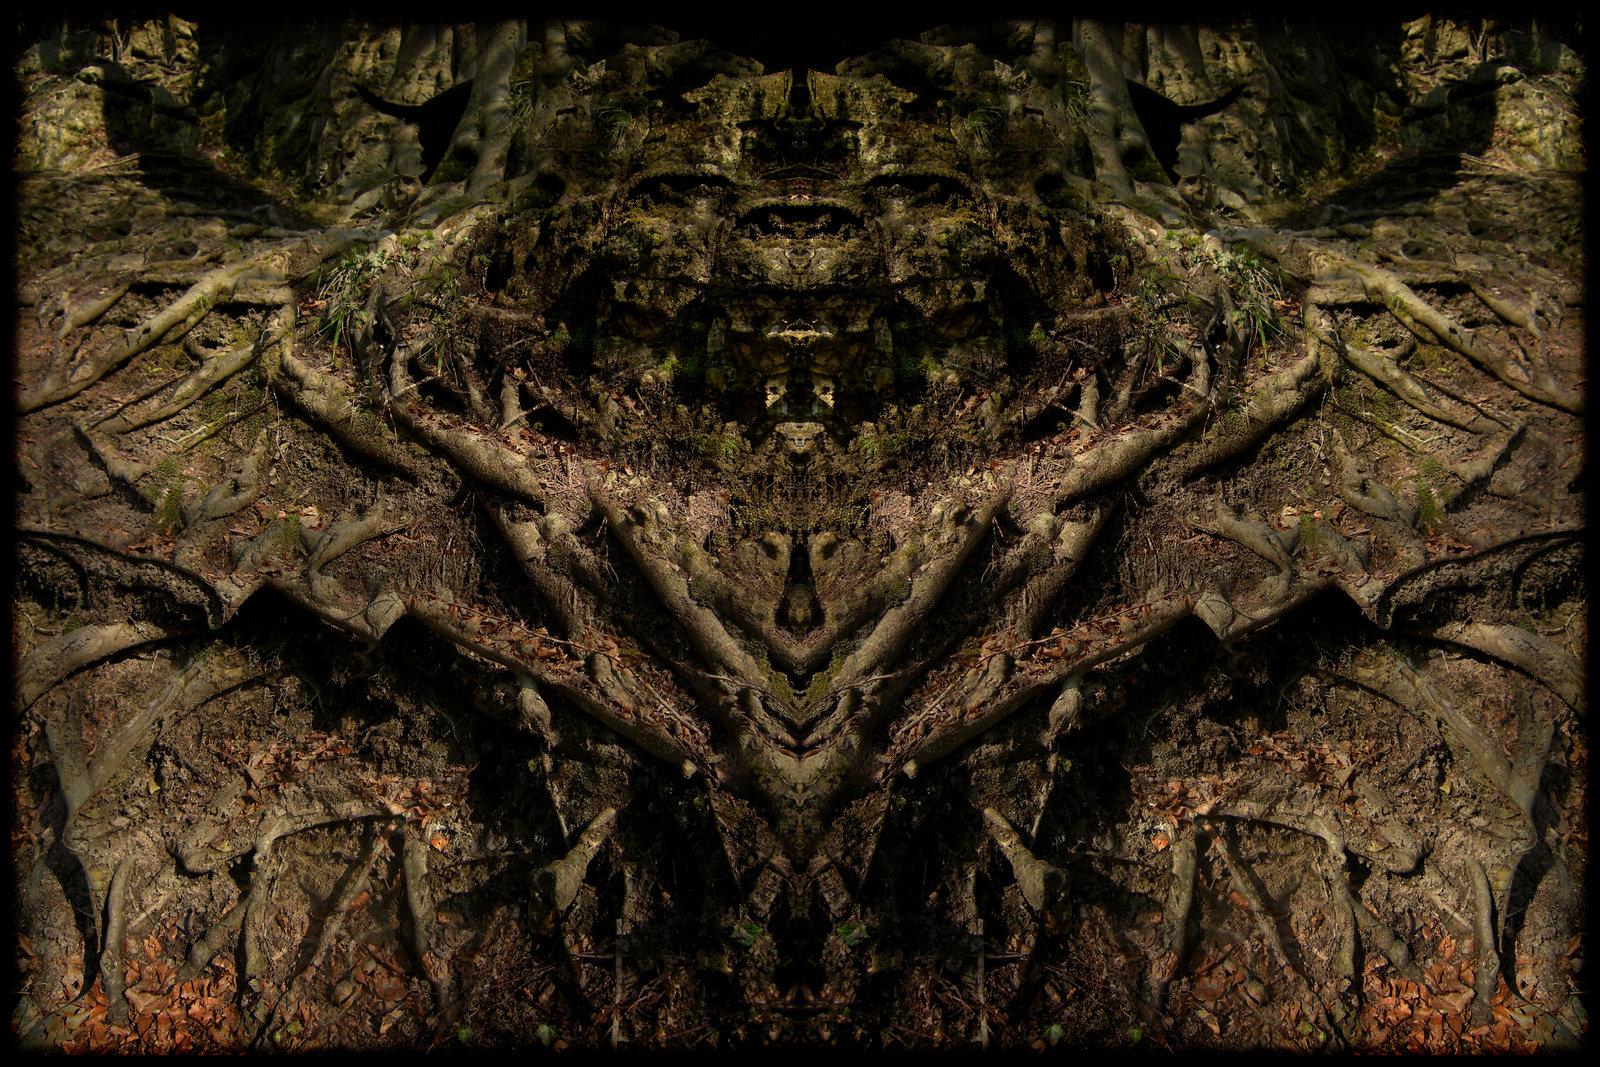 Occult Computer Wallpapers Desktop Backgrounds 1600x1067 ID 1600x1067